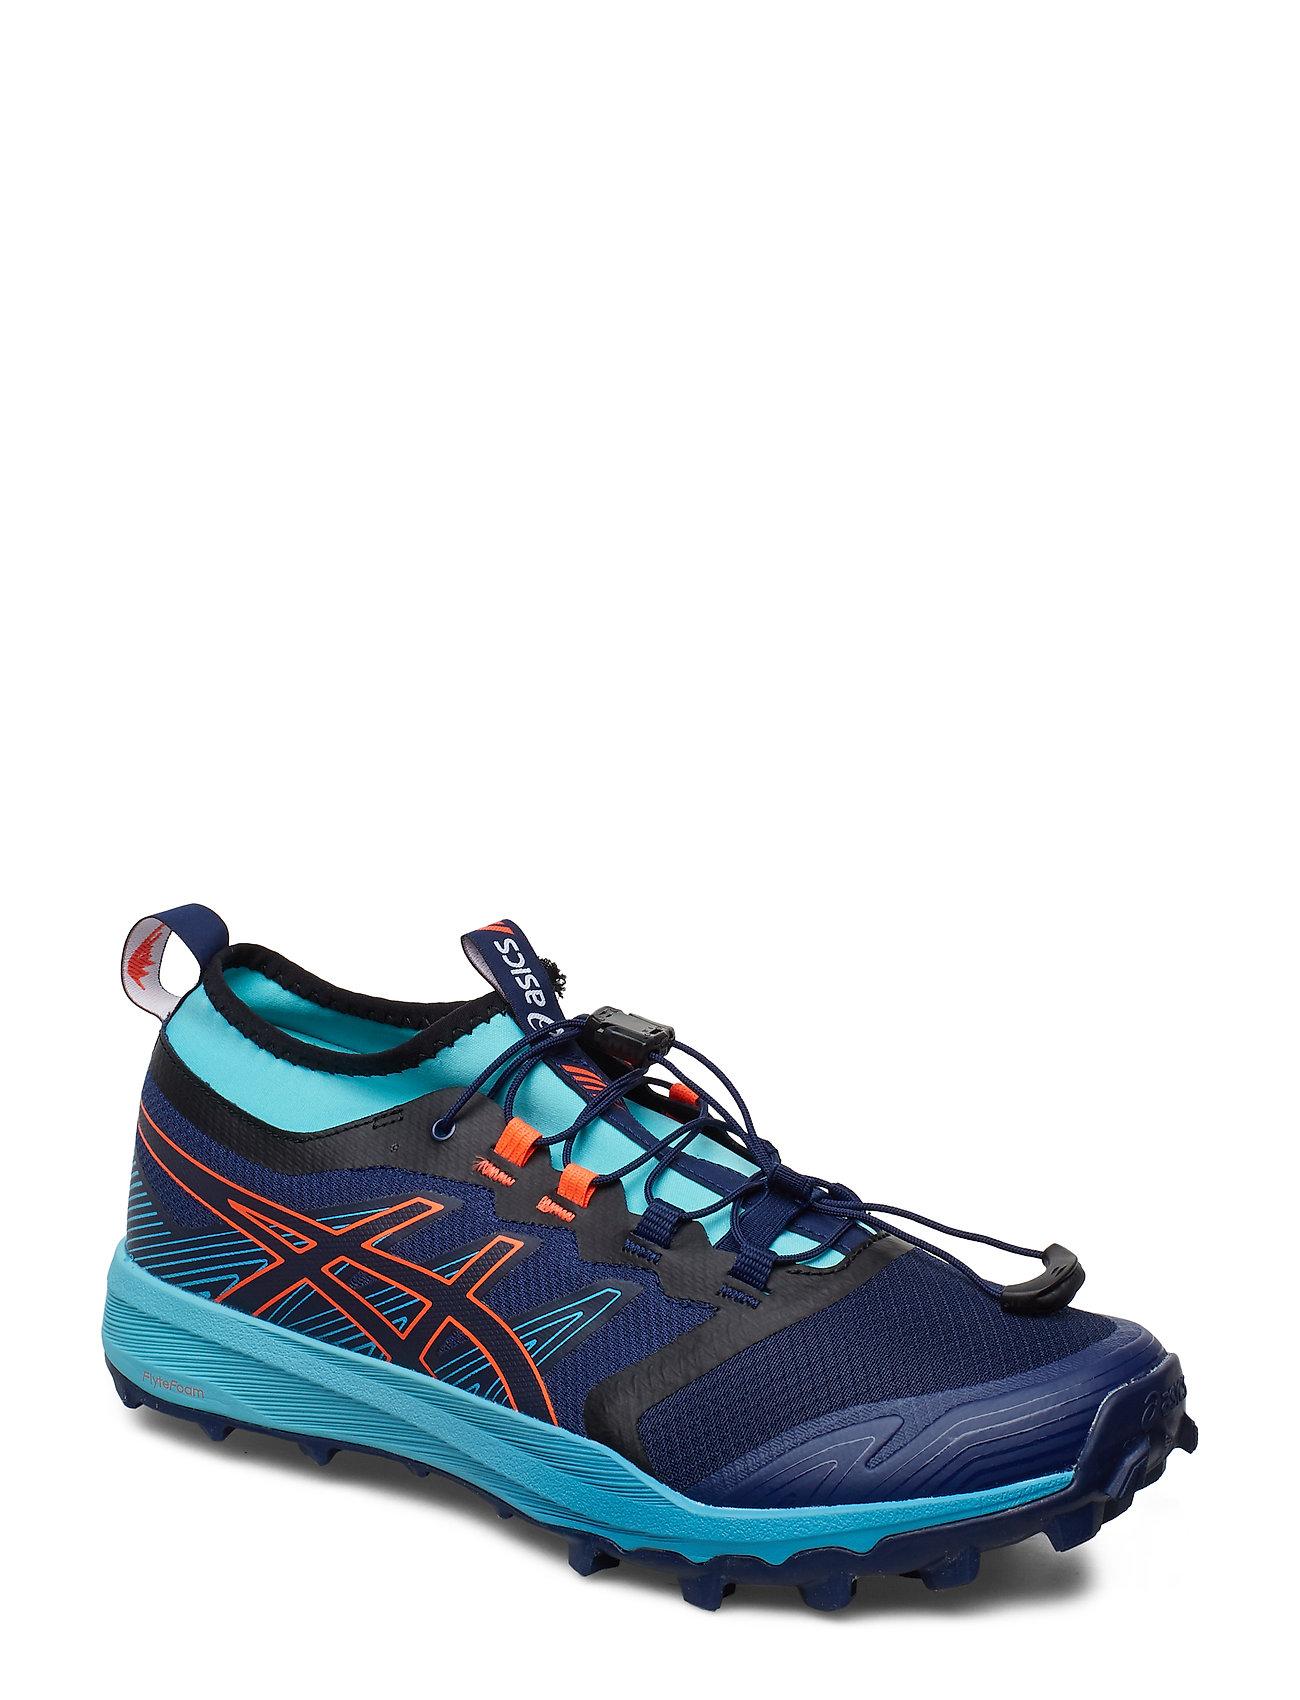 ASICS Fujitrabuco Pro Shoes Sport Shoes Running Shoes Blau ASICS